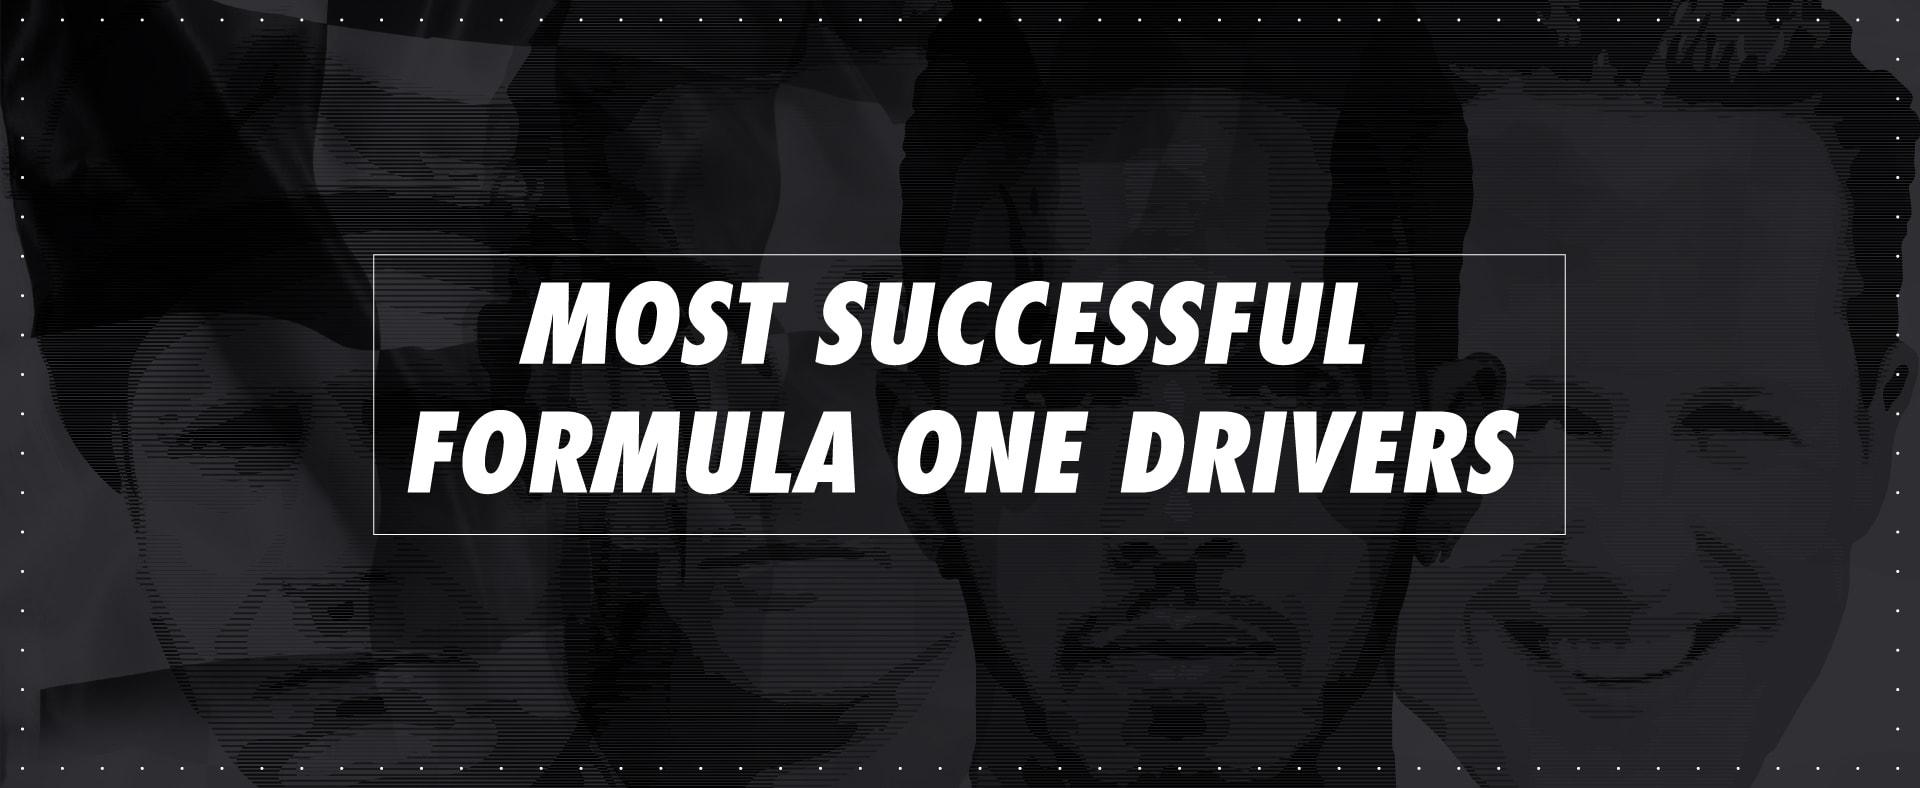 Most Successful F1 drivers